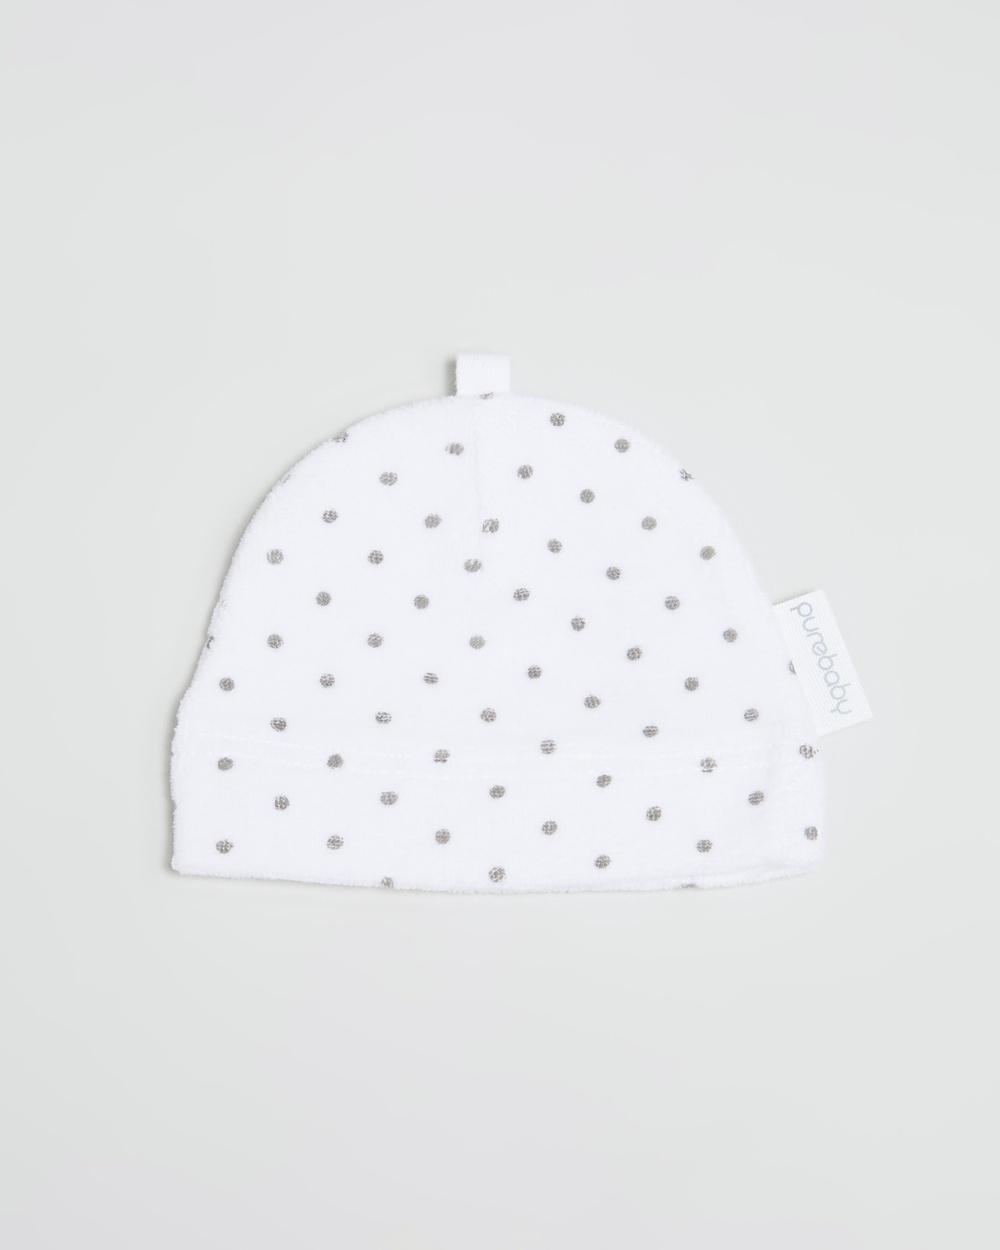 Purebaby Premie Hat Babies Headwear White & Grey Spot